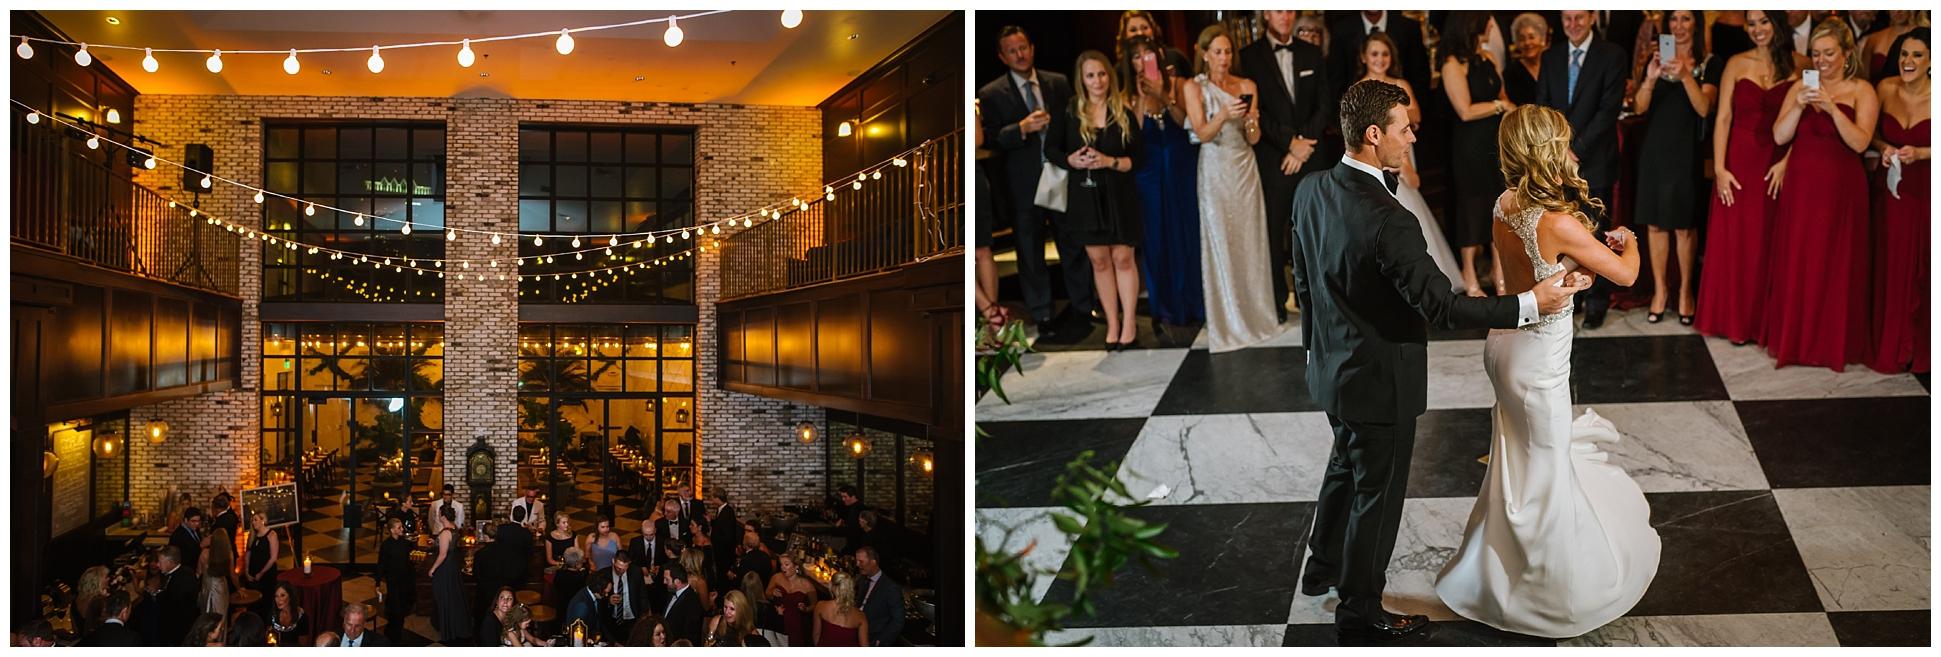 Oxford-exchange-wedding-photogapher-garland-candels-bookstore-burgandy-botanica_0055.jpg